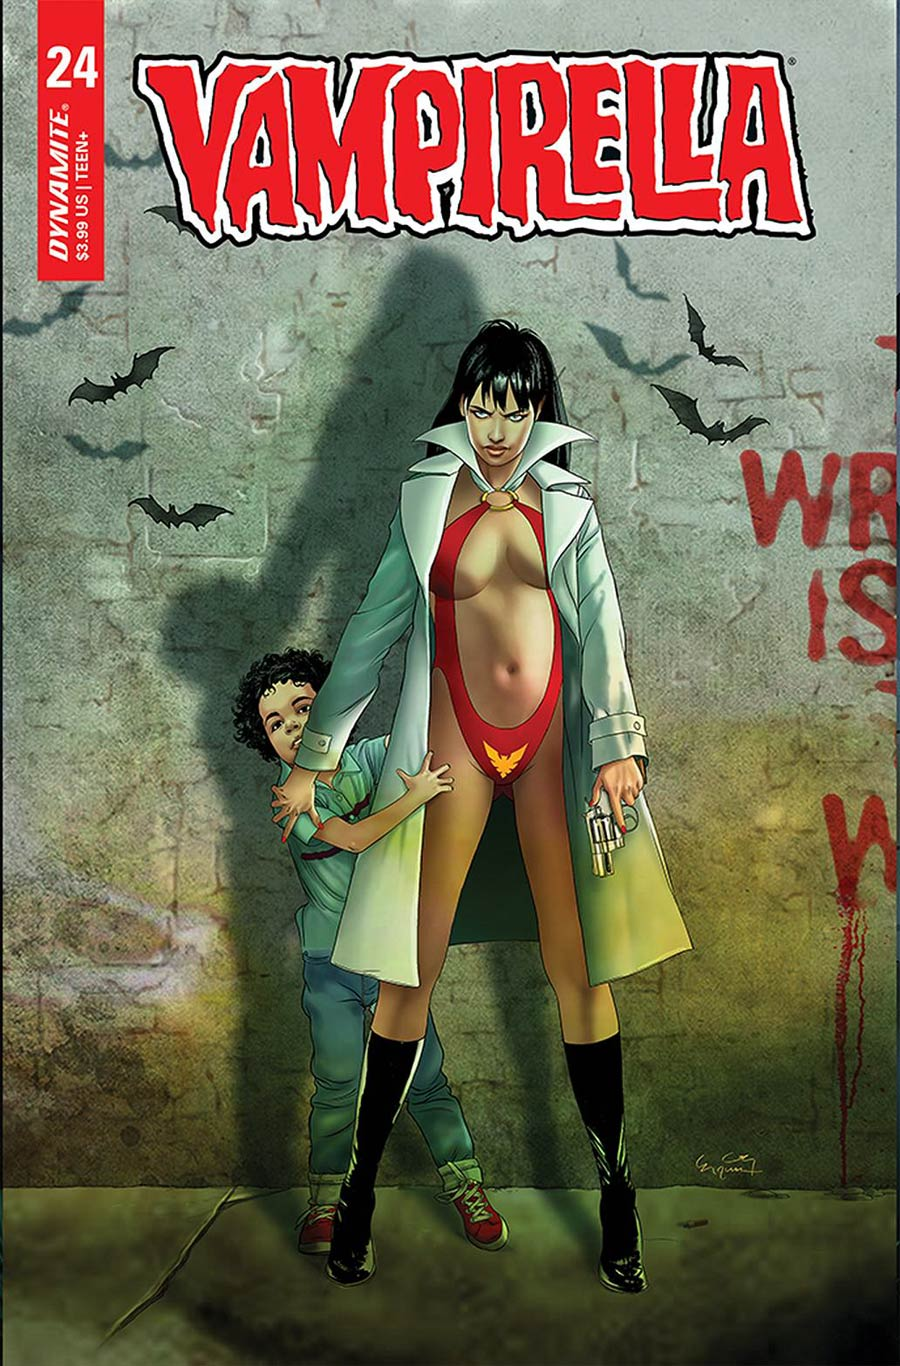 Vampirella Vol 8 #24 Cover D Variant Ergun Gunduz Cover